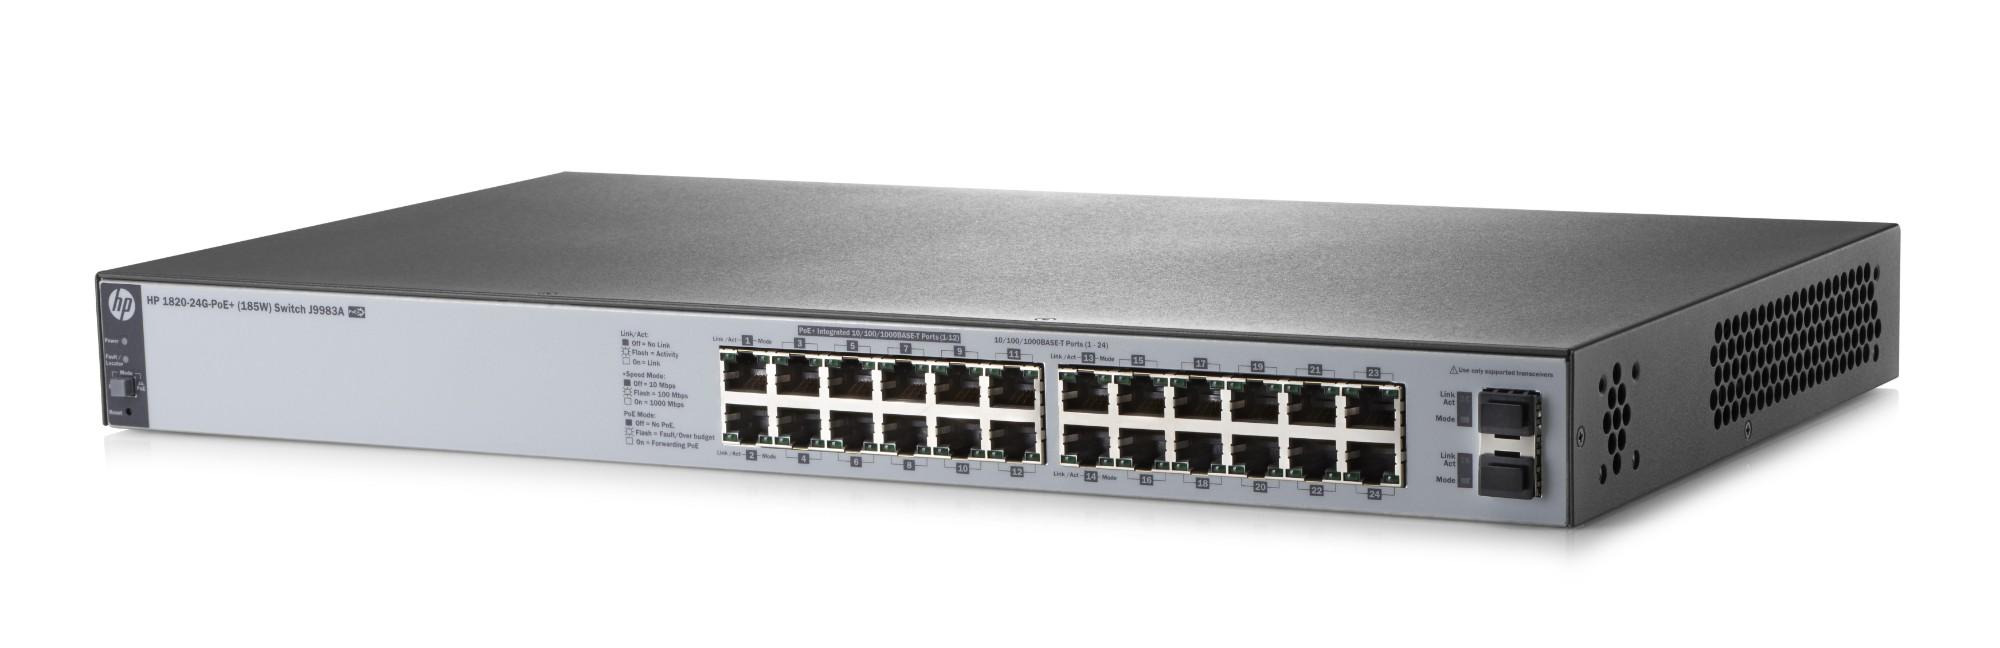 Hewlett Packard Enterprise 1820-24G-PoE+ (185W) Gestionado L2 Gigabit Ethernet (10/100/1000) Gris 1U Energía sobre Ethernet (PoE)